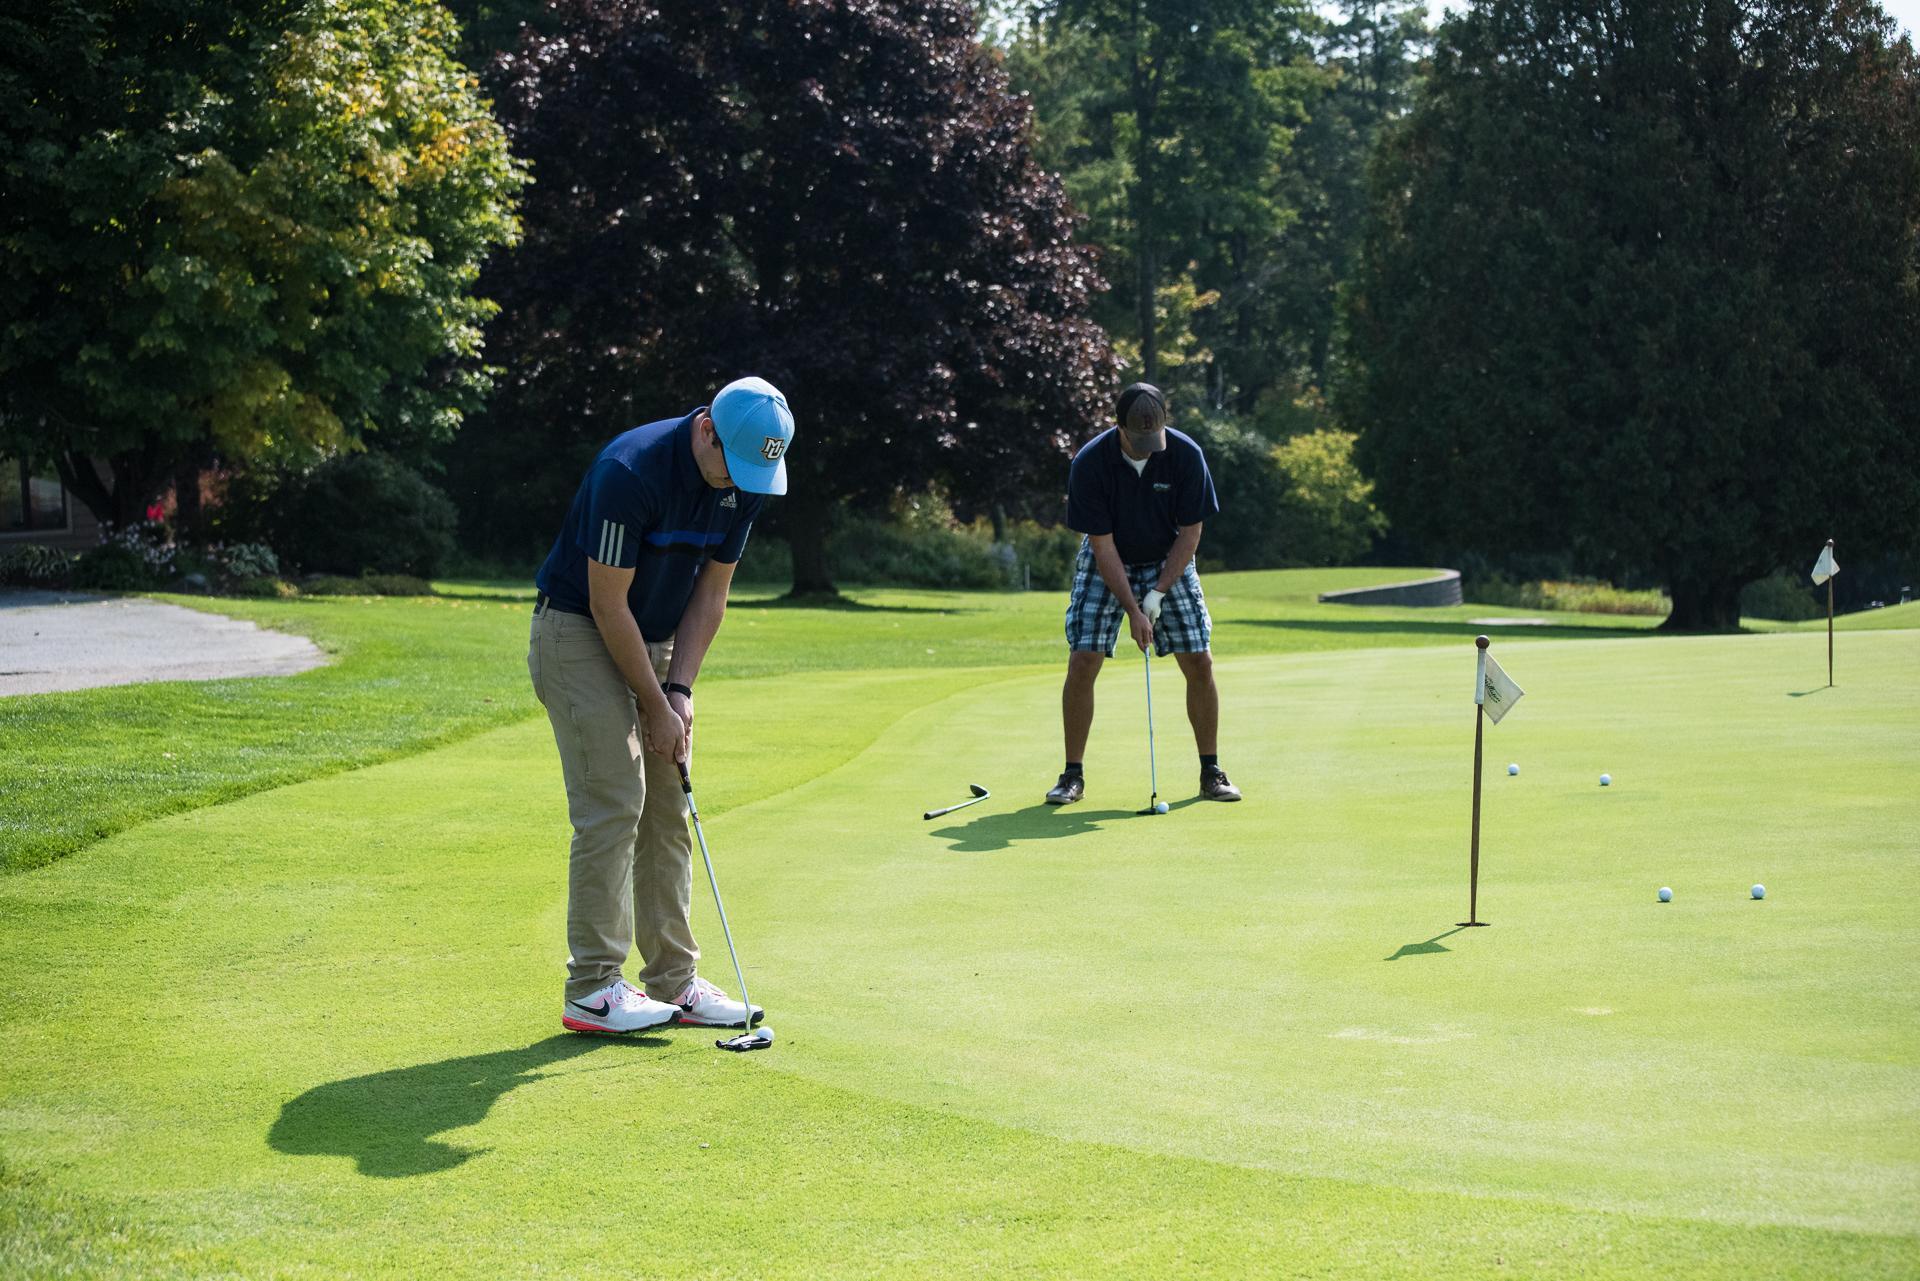 AIAVT Annual Guy Teschmacher Golf Tournament 2021